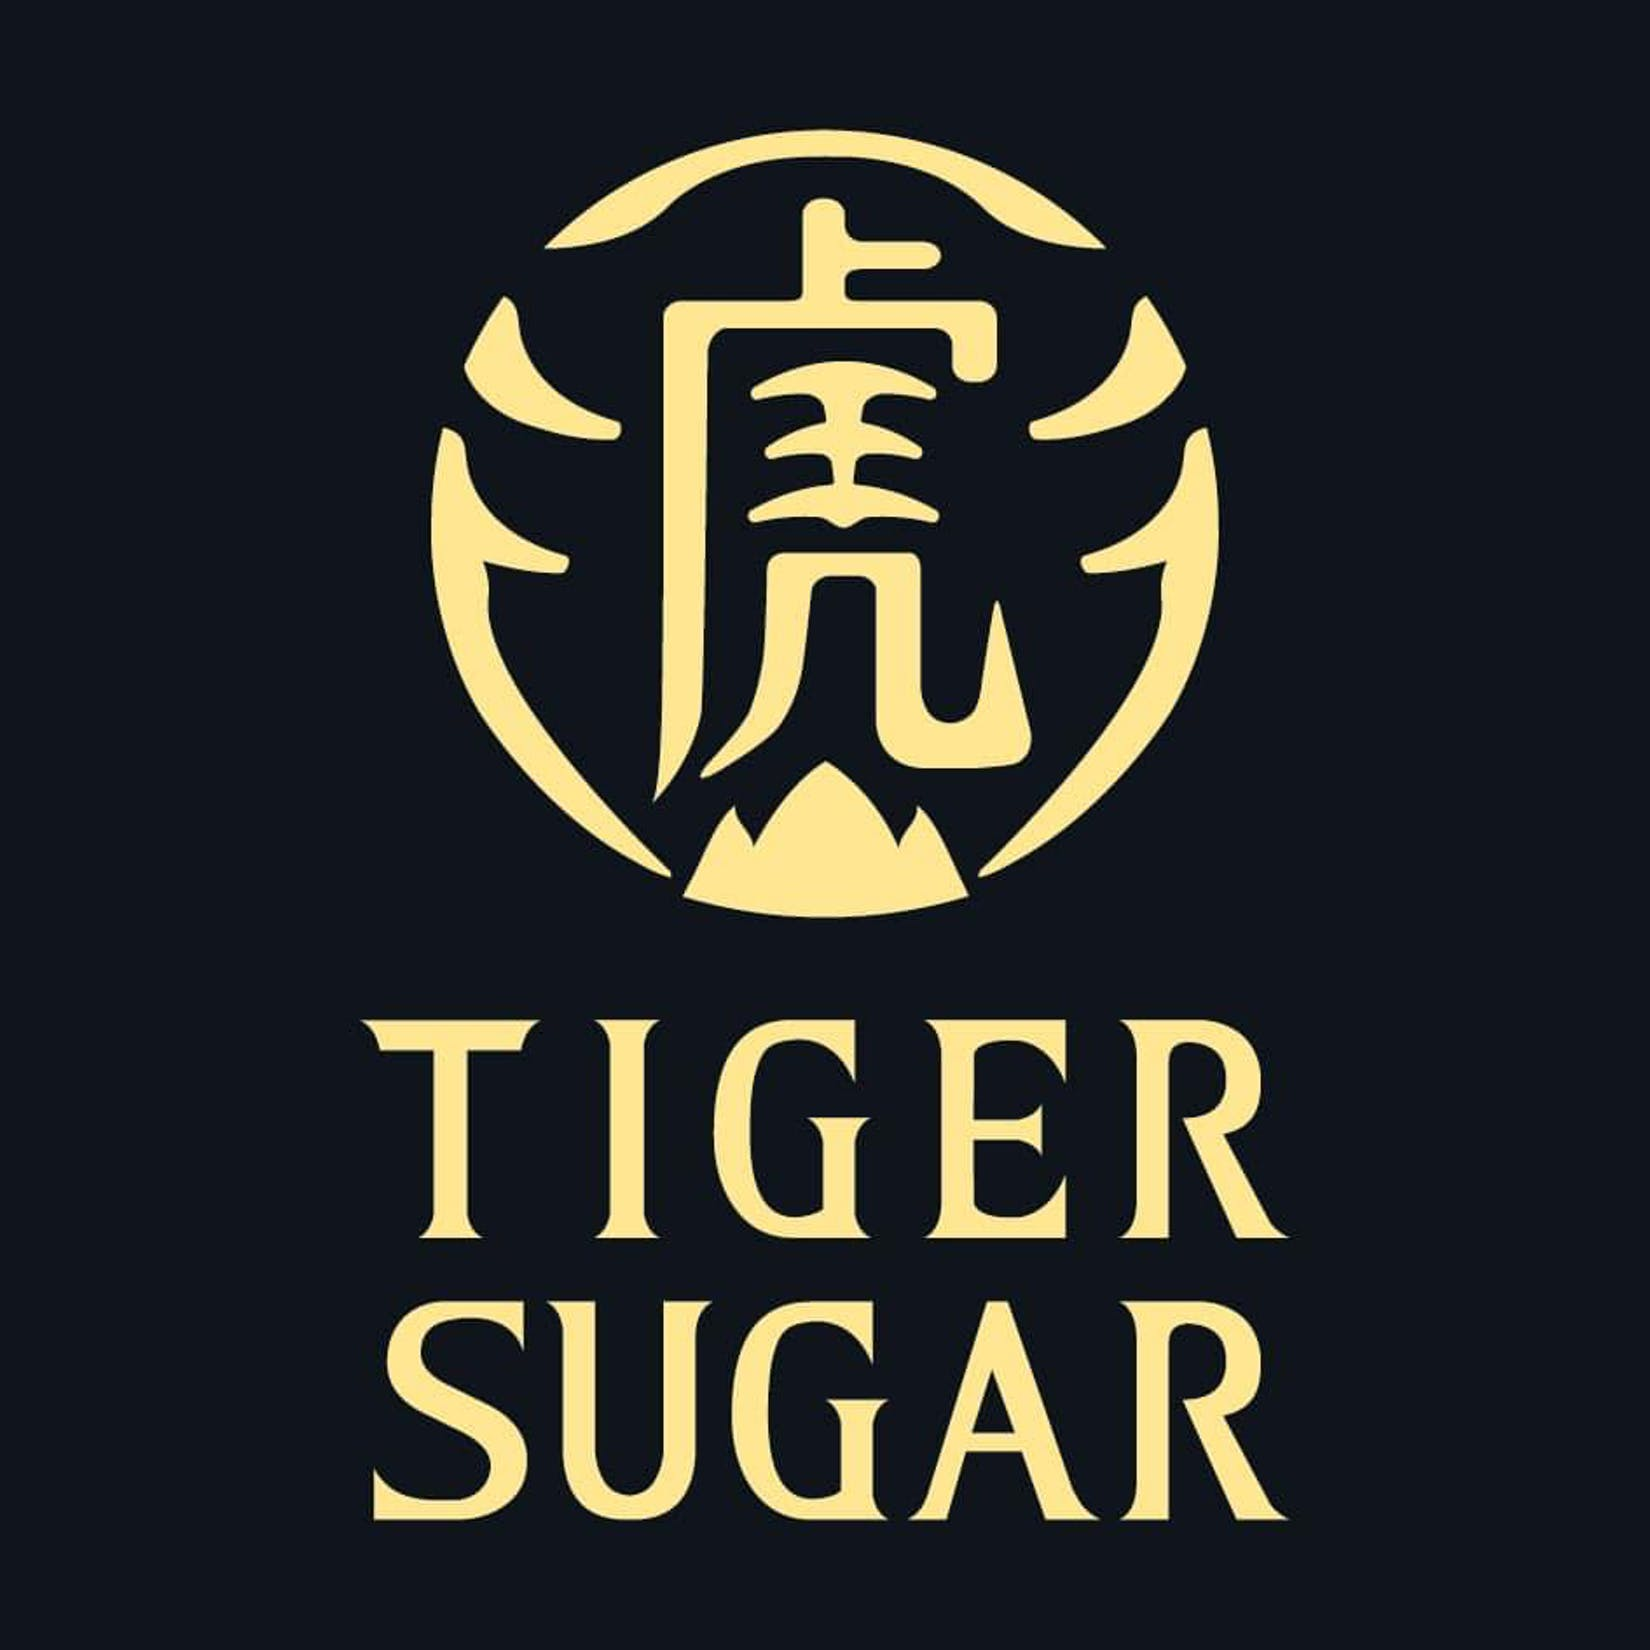 Tiger Sugar Myanmar (Junction City) | yathar